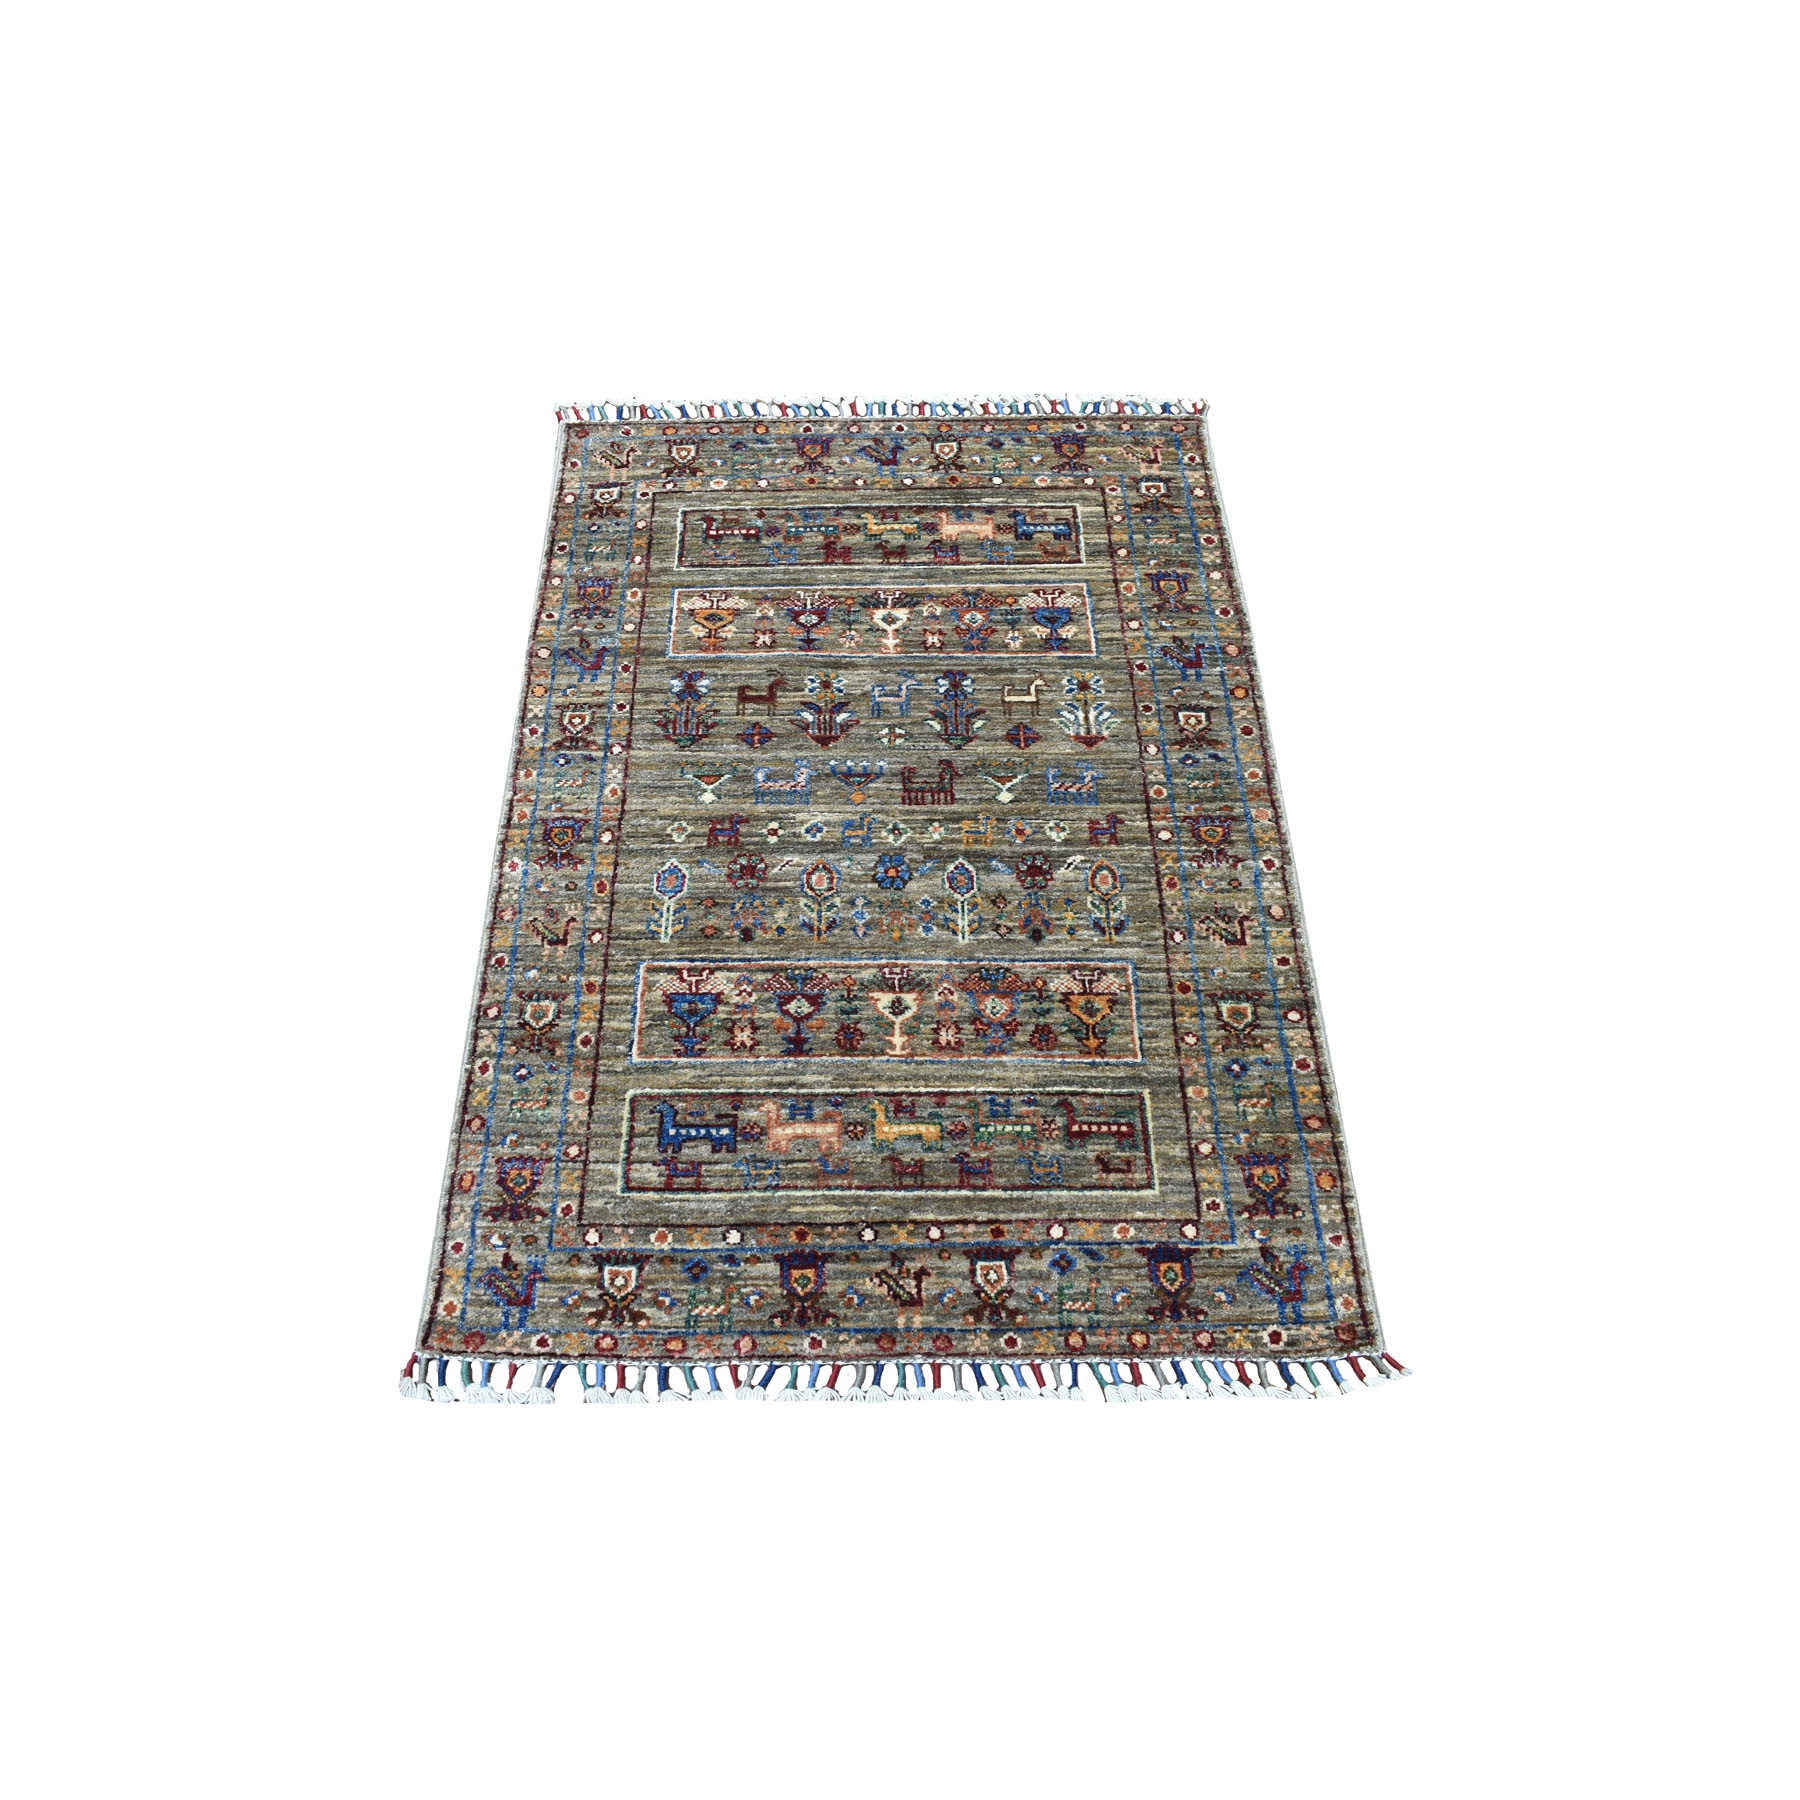 "2'6""x3'10"" Gray With Colorful Tassles Hand Knotted Super Kazak Khorjin Design Vibrant Wool Oriental Rug"